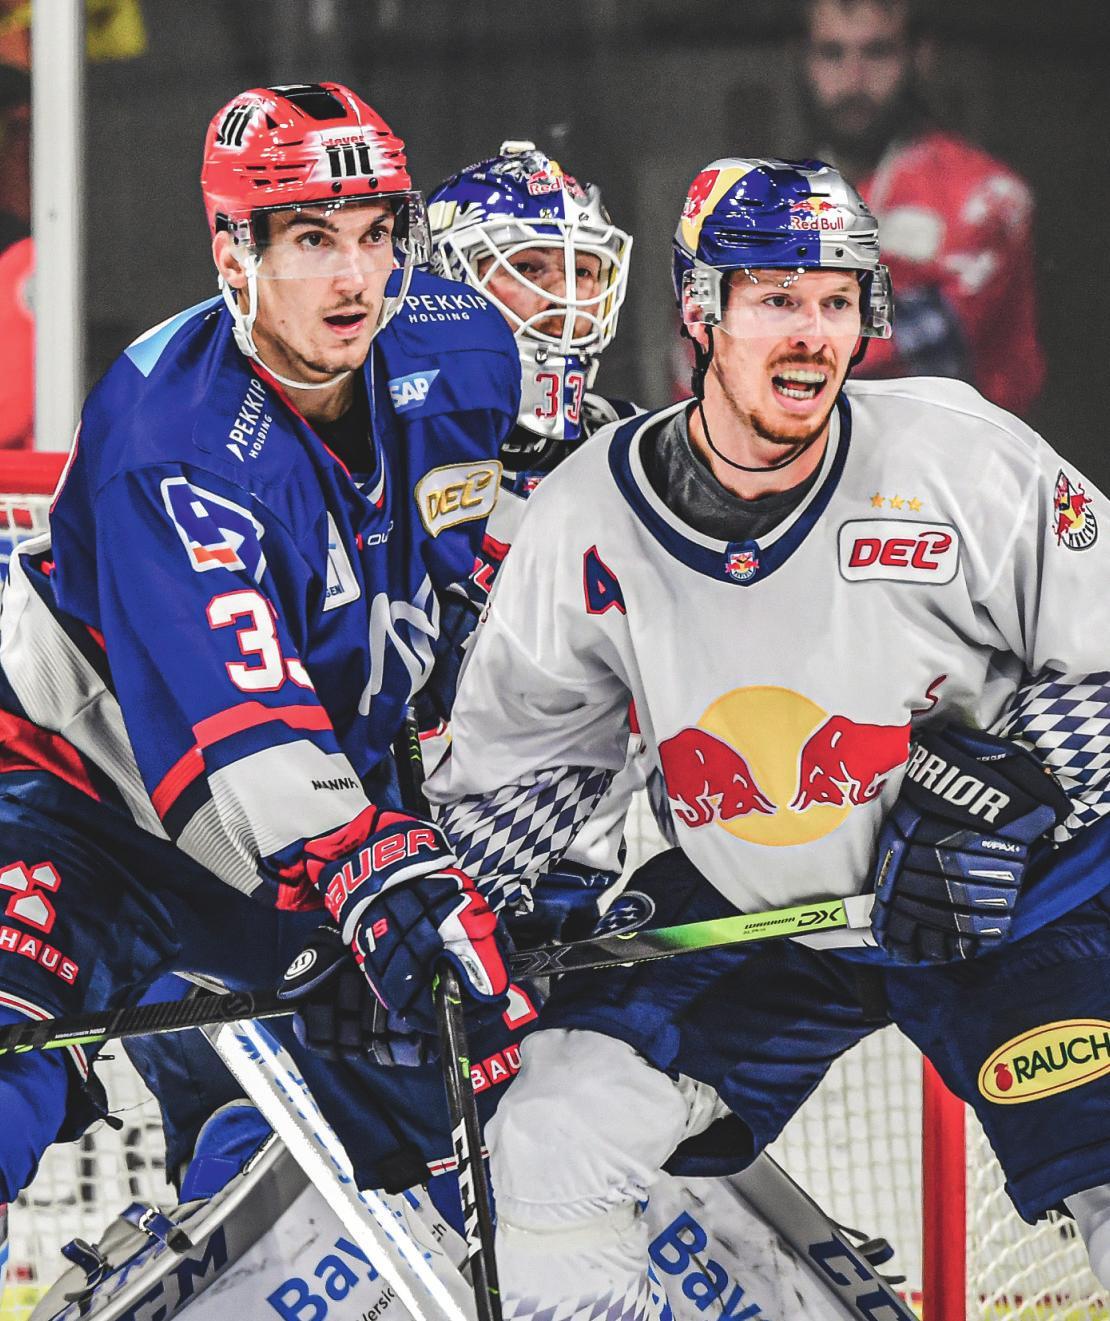 Alles auf die Karte Eishockey Image 4